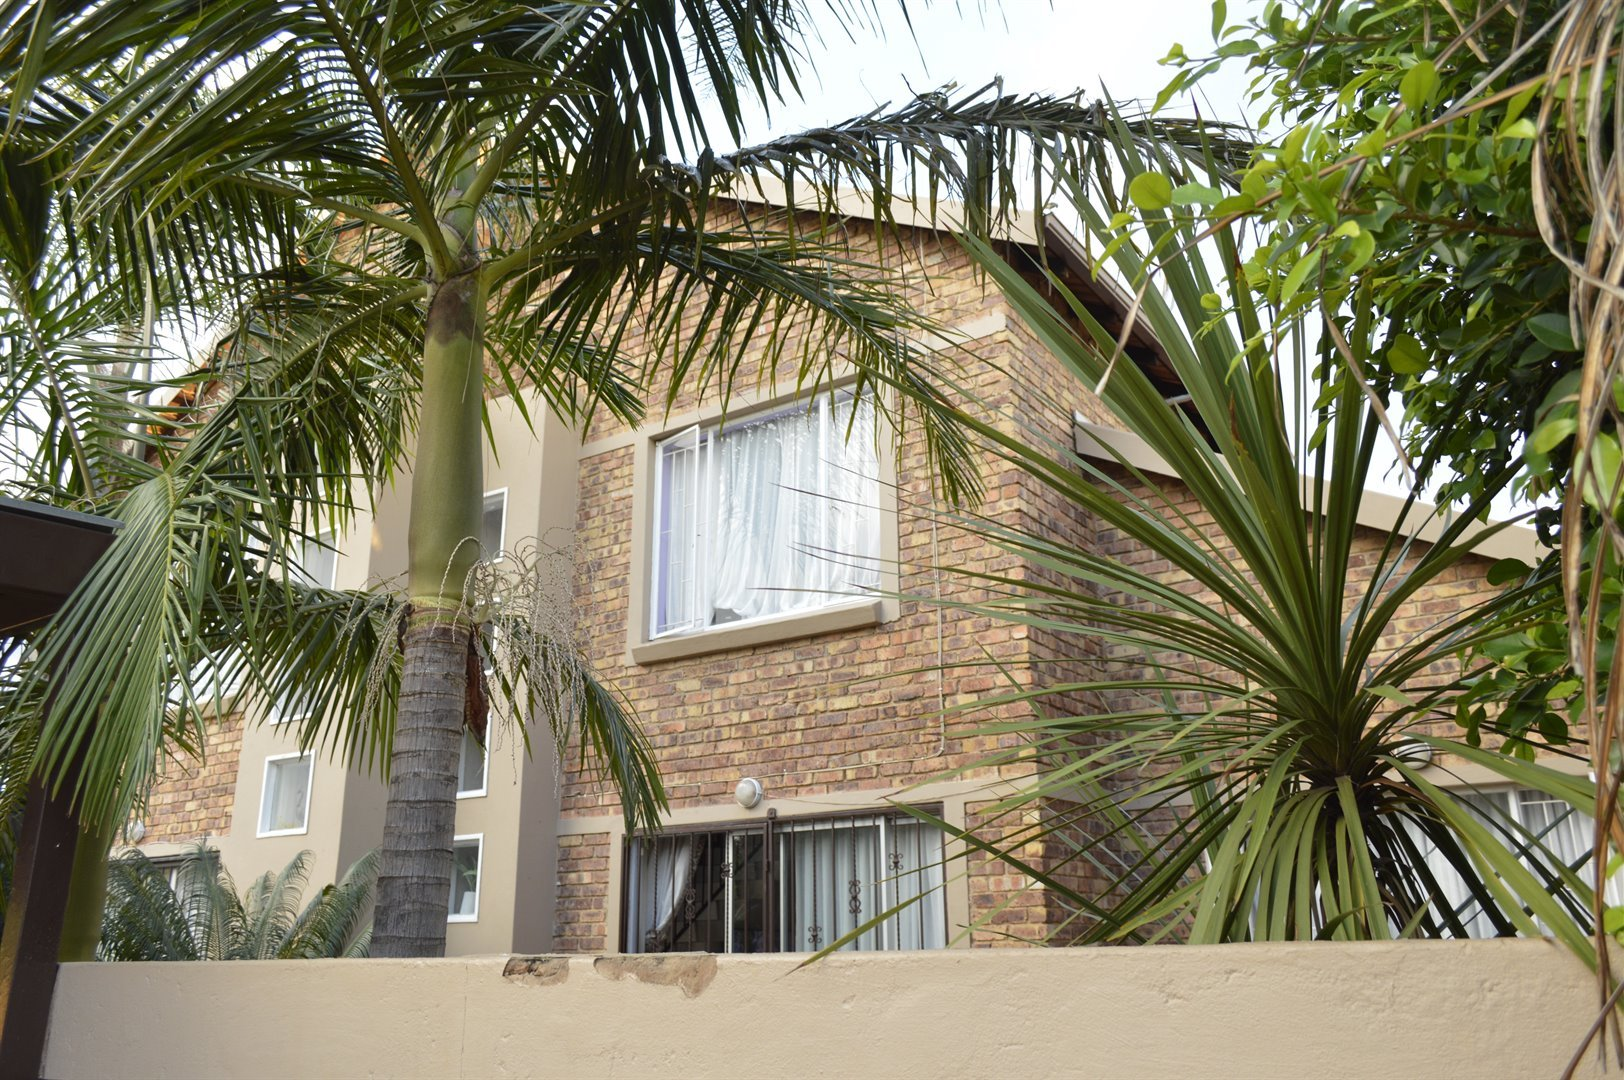 Heuwelsig Estate property for sale. Ref No: 13463647. Picture no 1